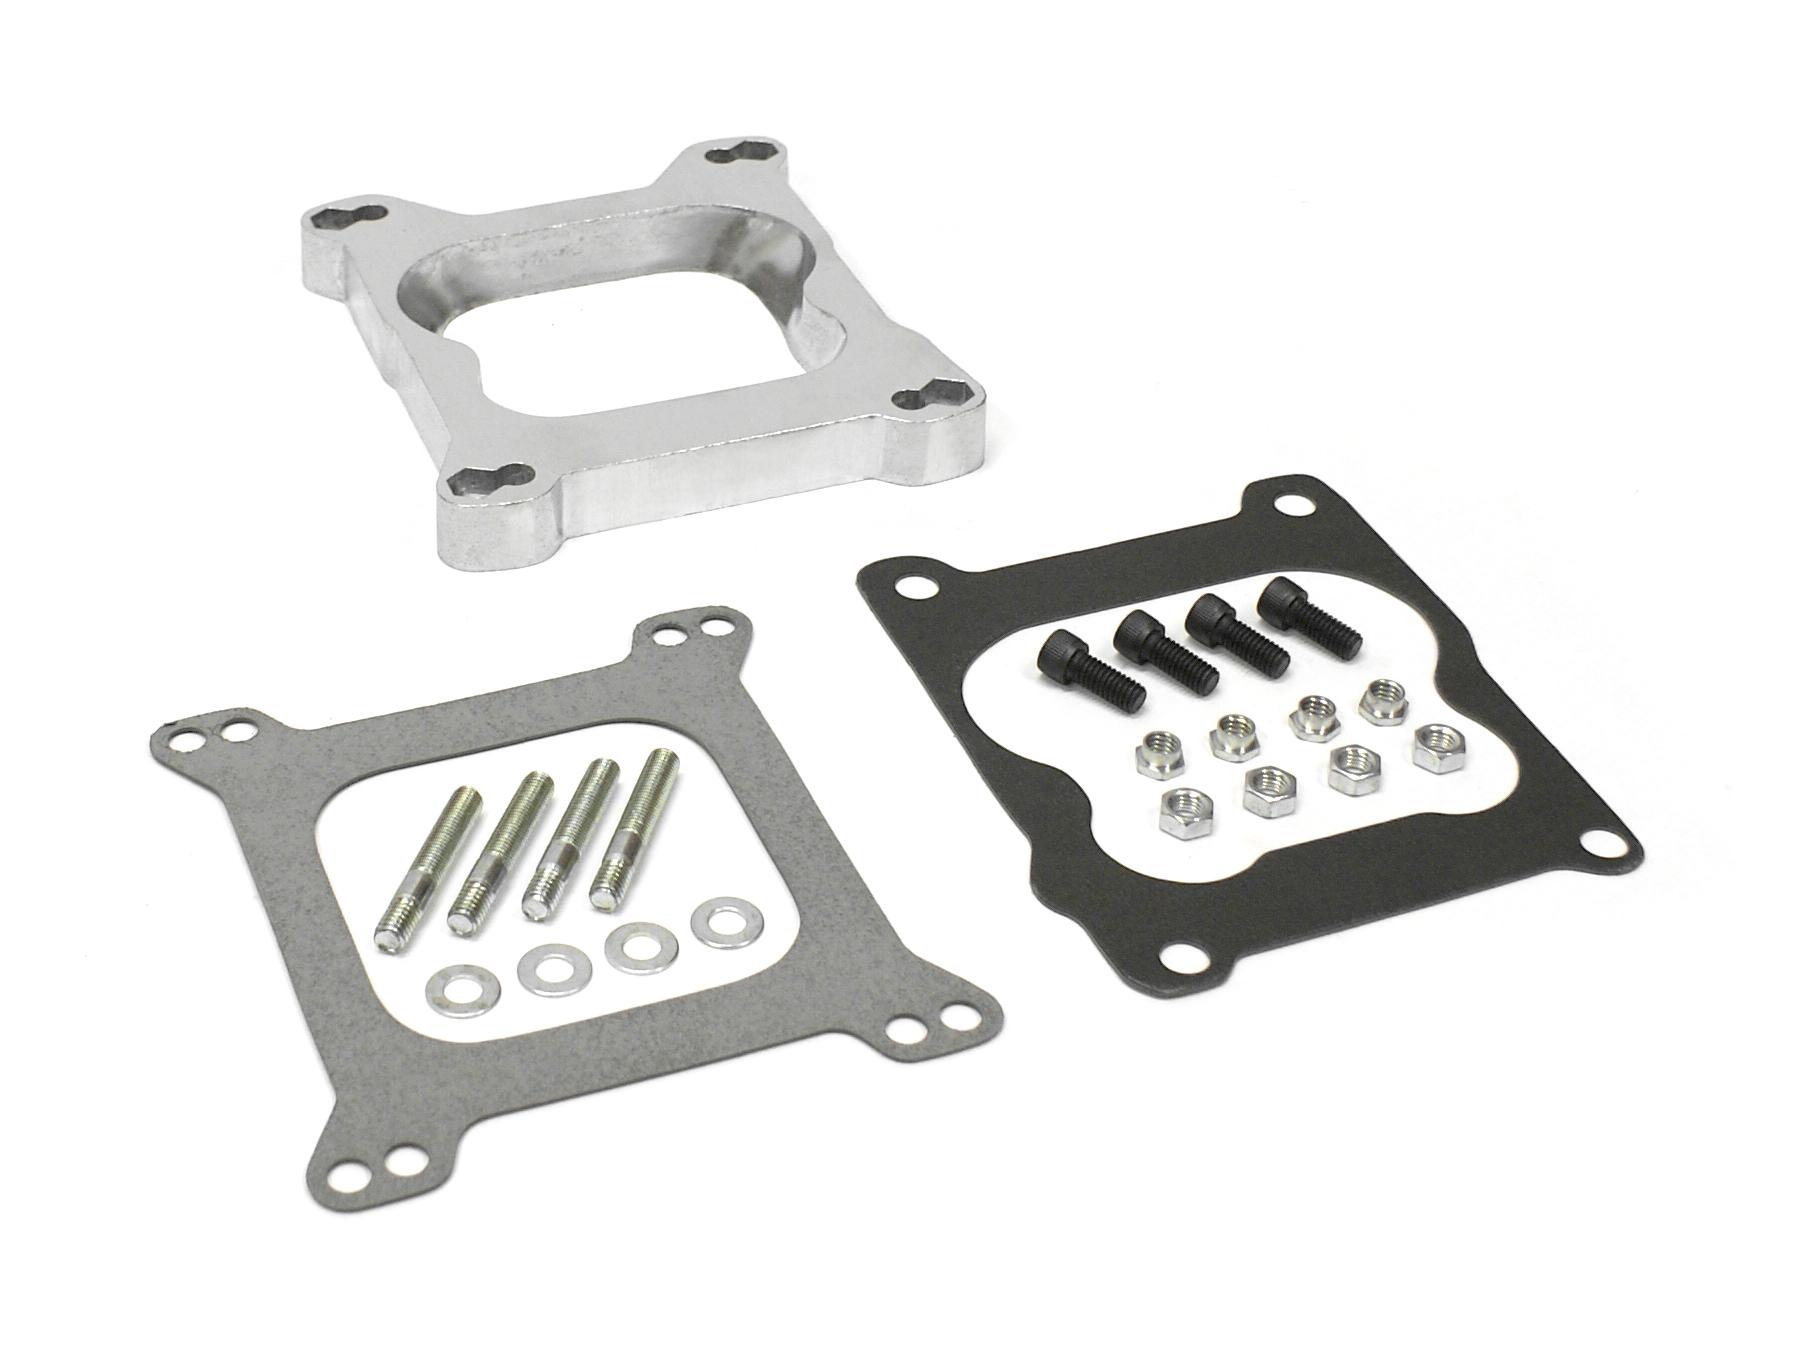 "1"" Aluminum Carb Adapter Holley to Quadrajet Q-Jet and Spreadbore"